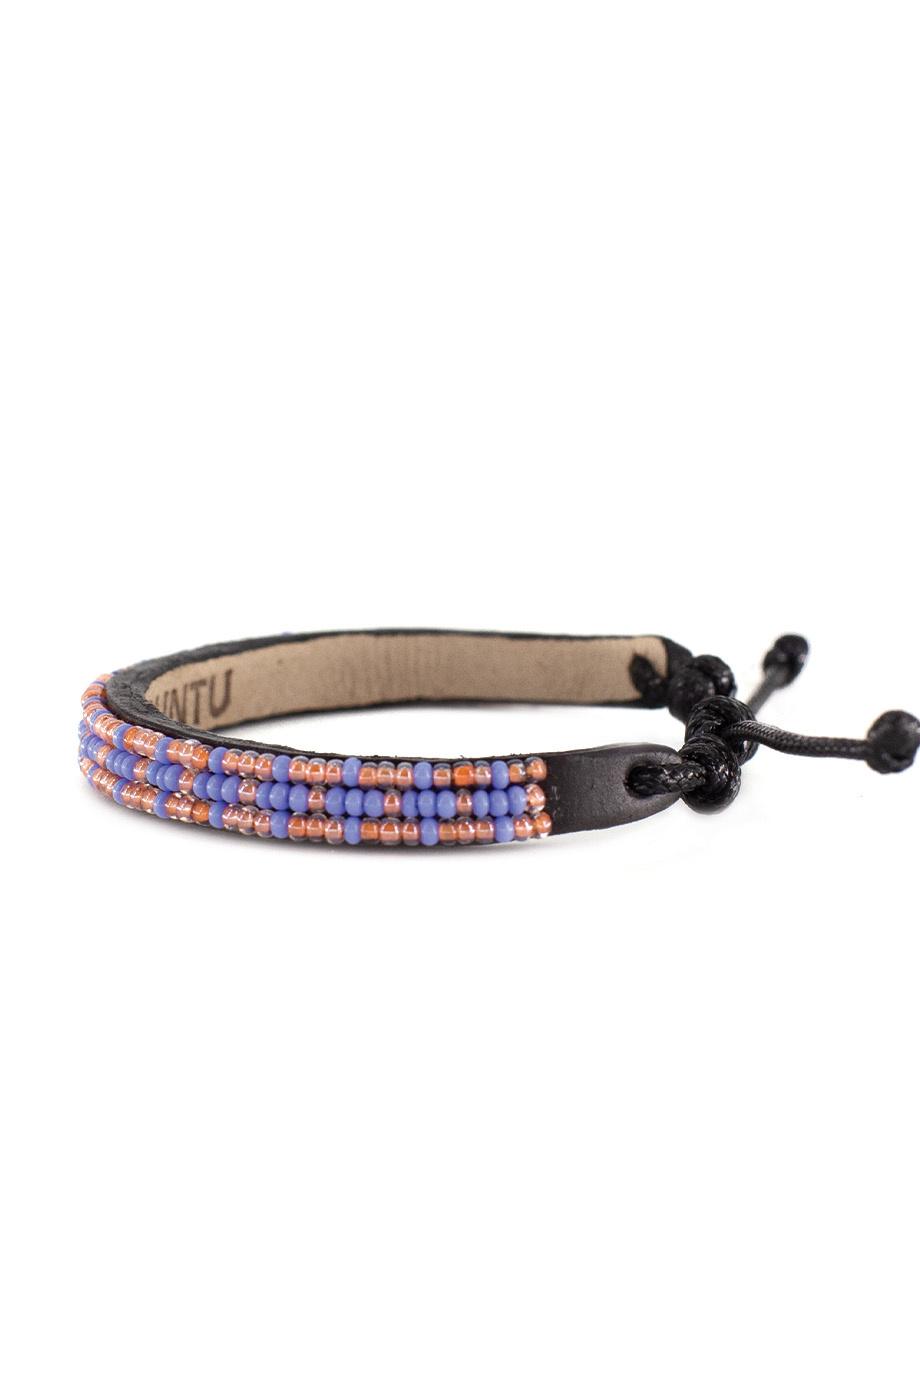 3 row Msalaba Bracelet Pearl/Periwinkle-2